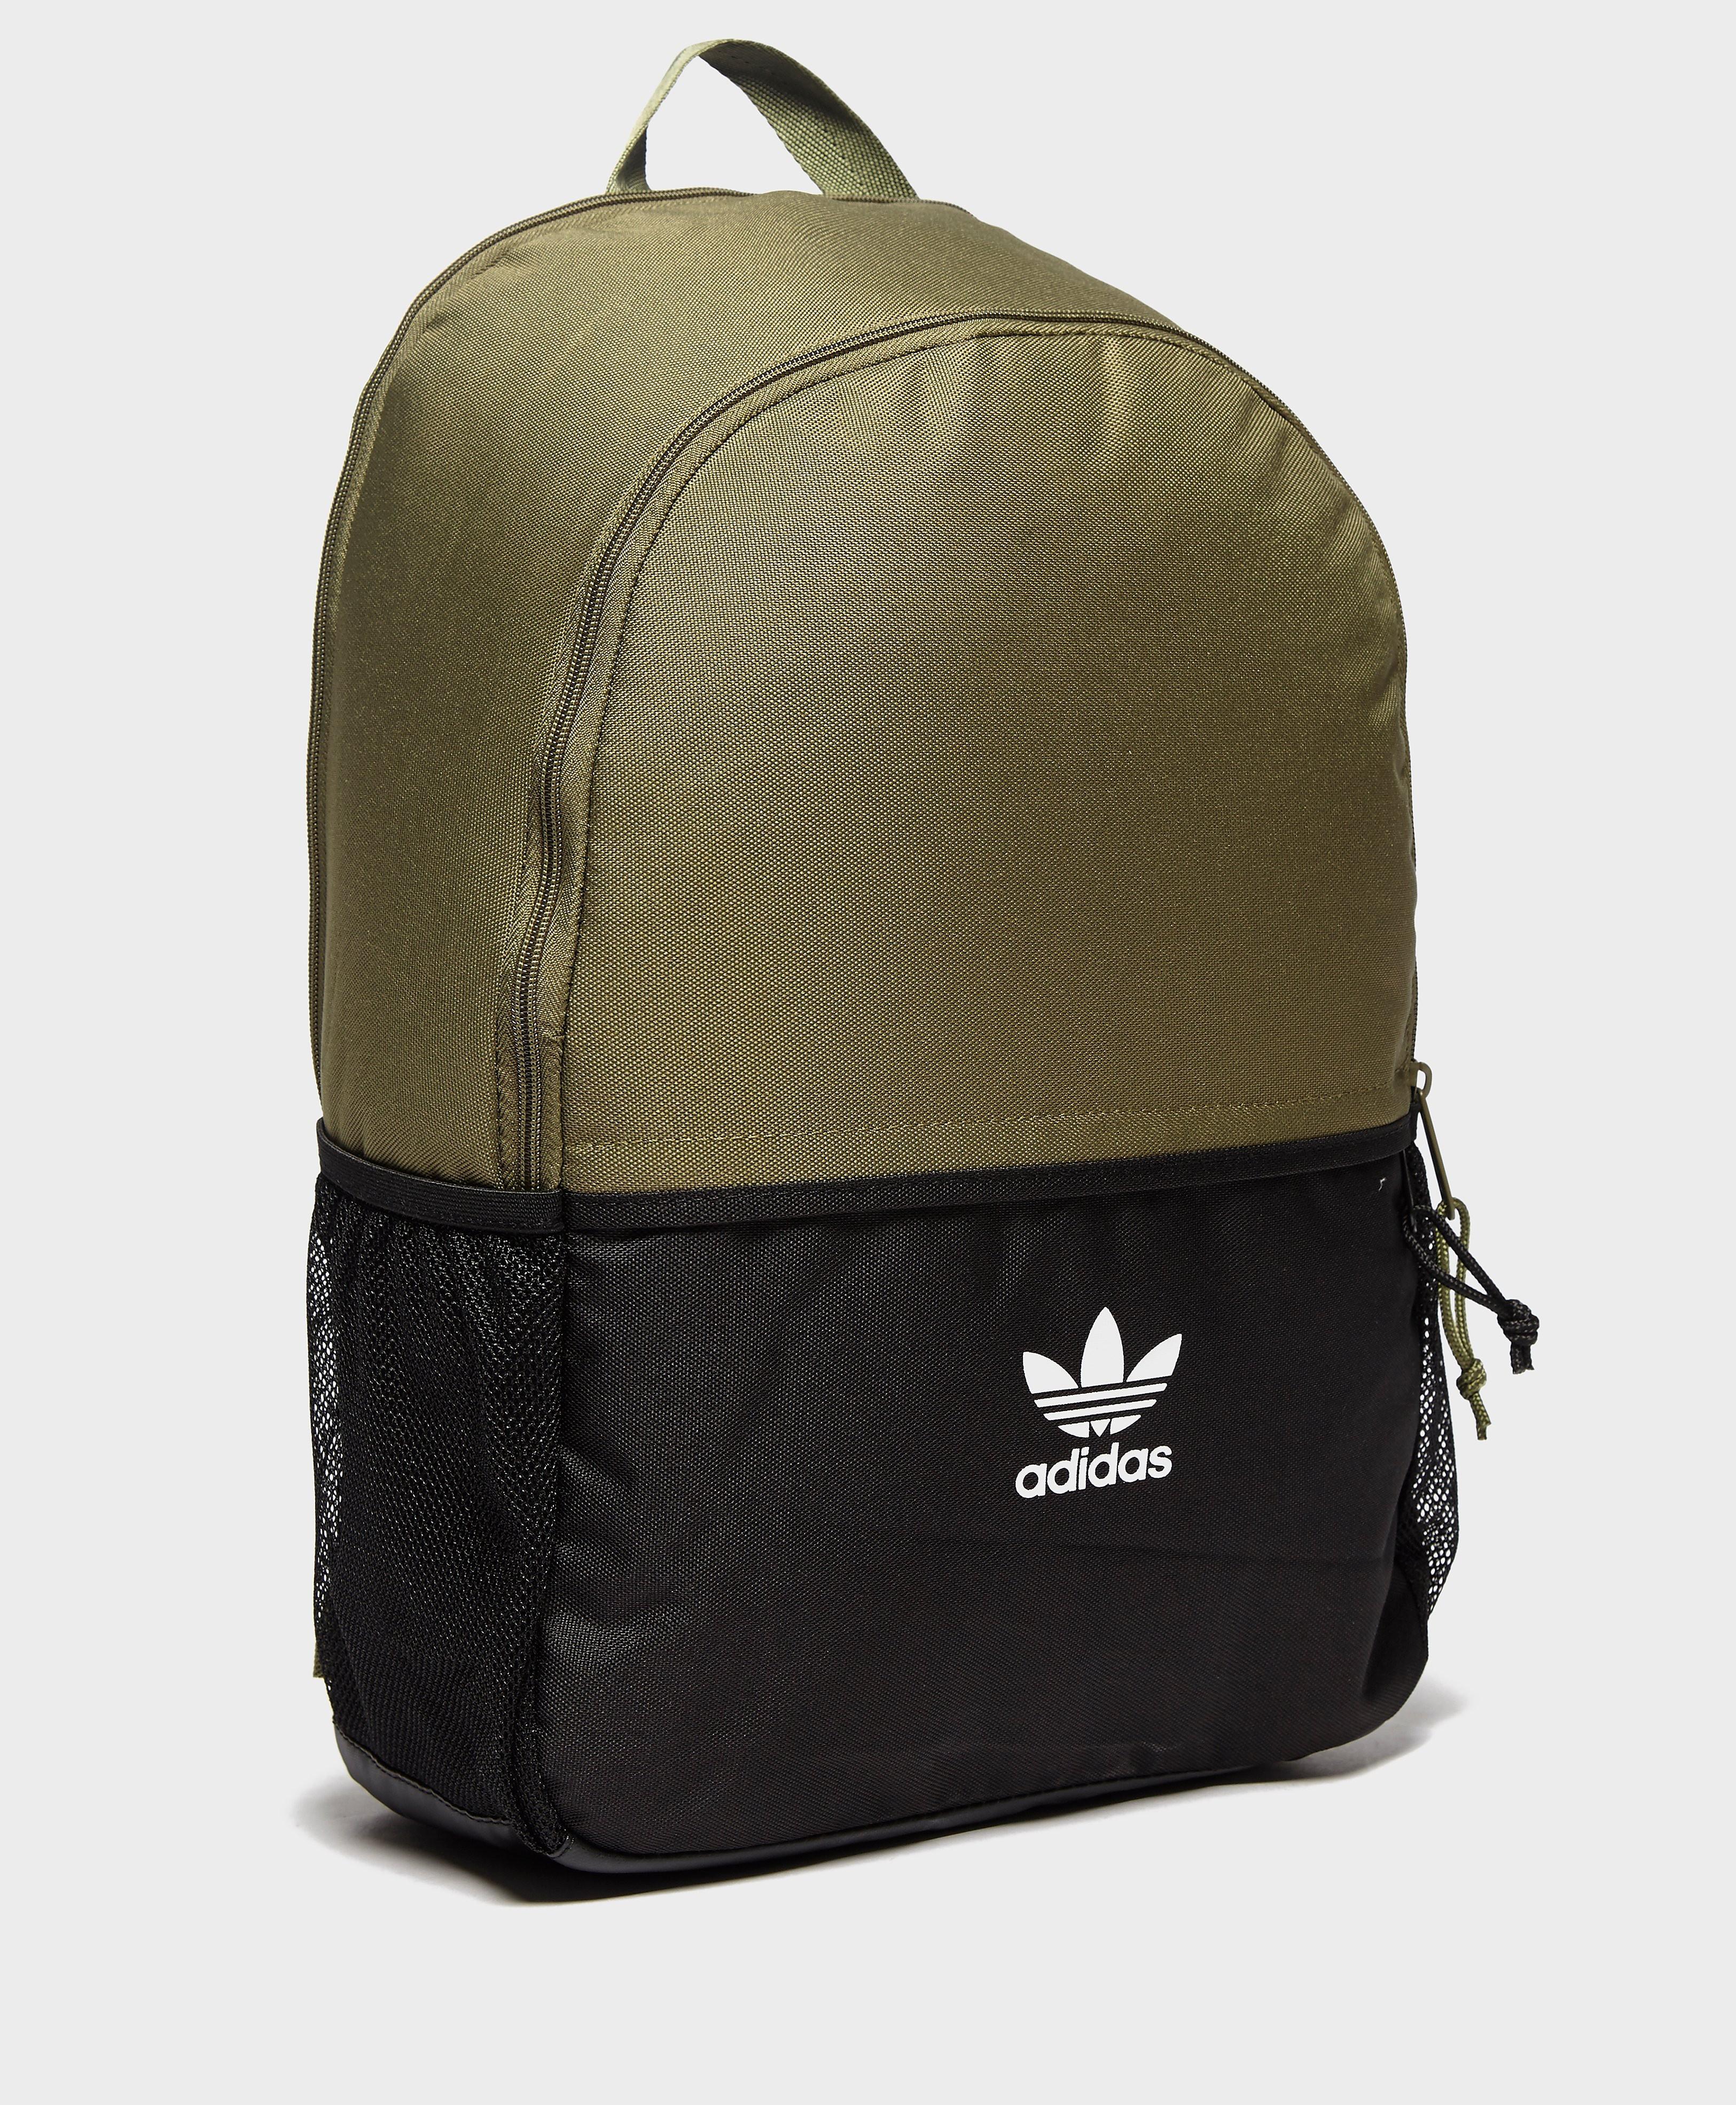 adidas Originals Split Back Pack